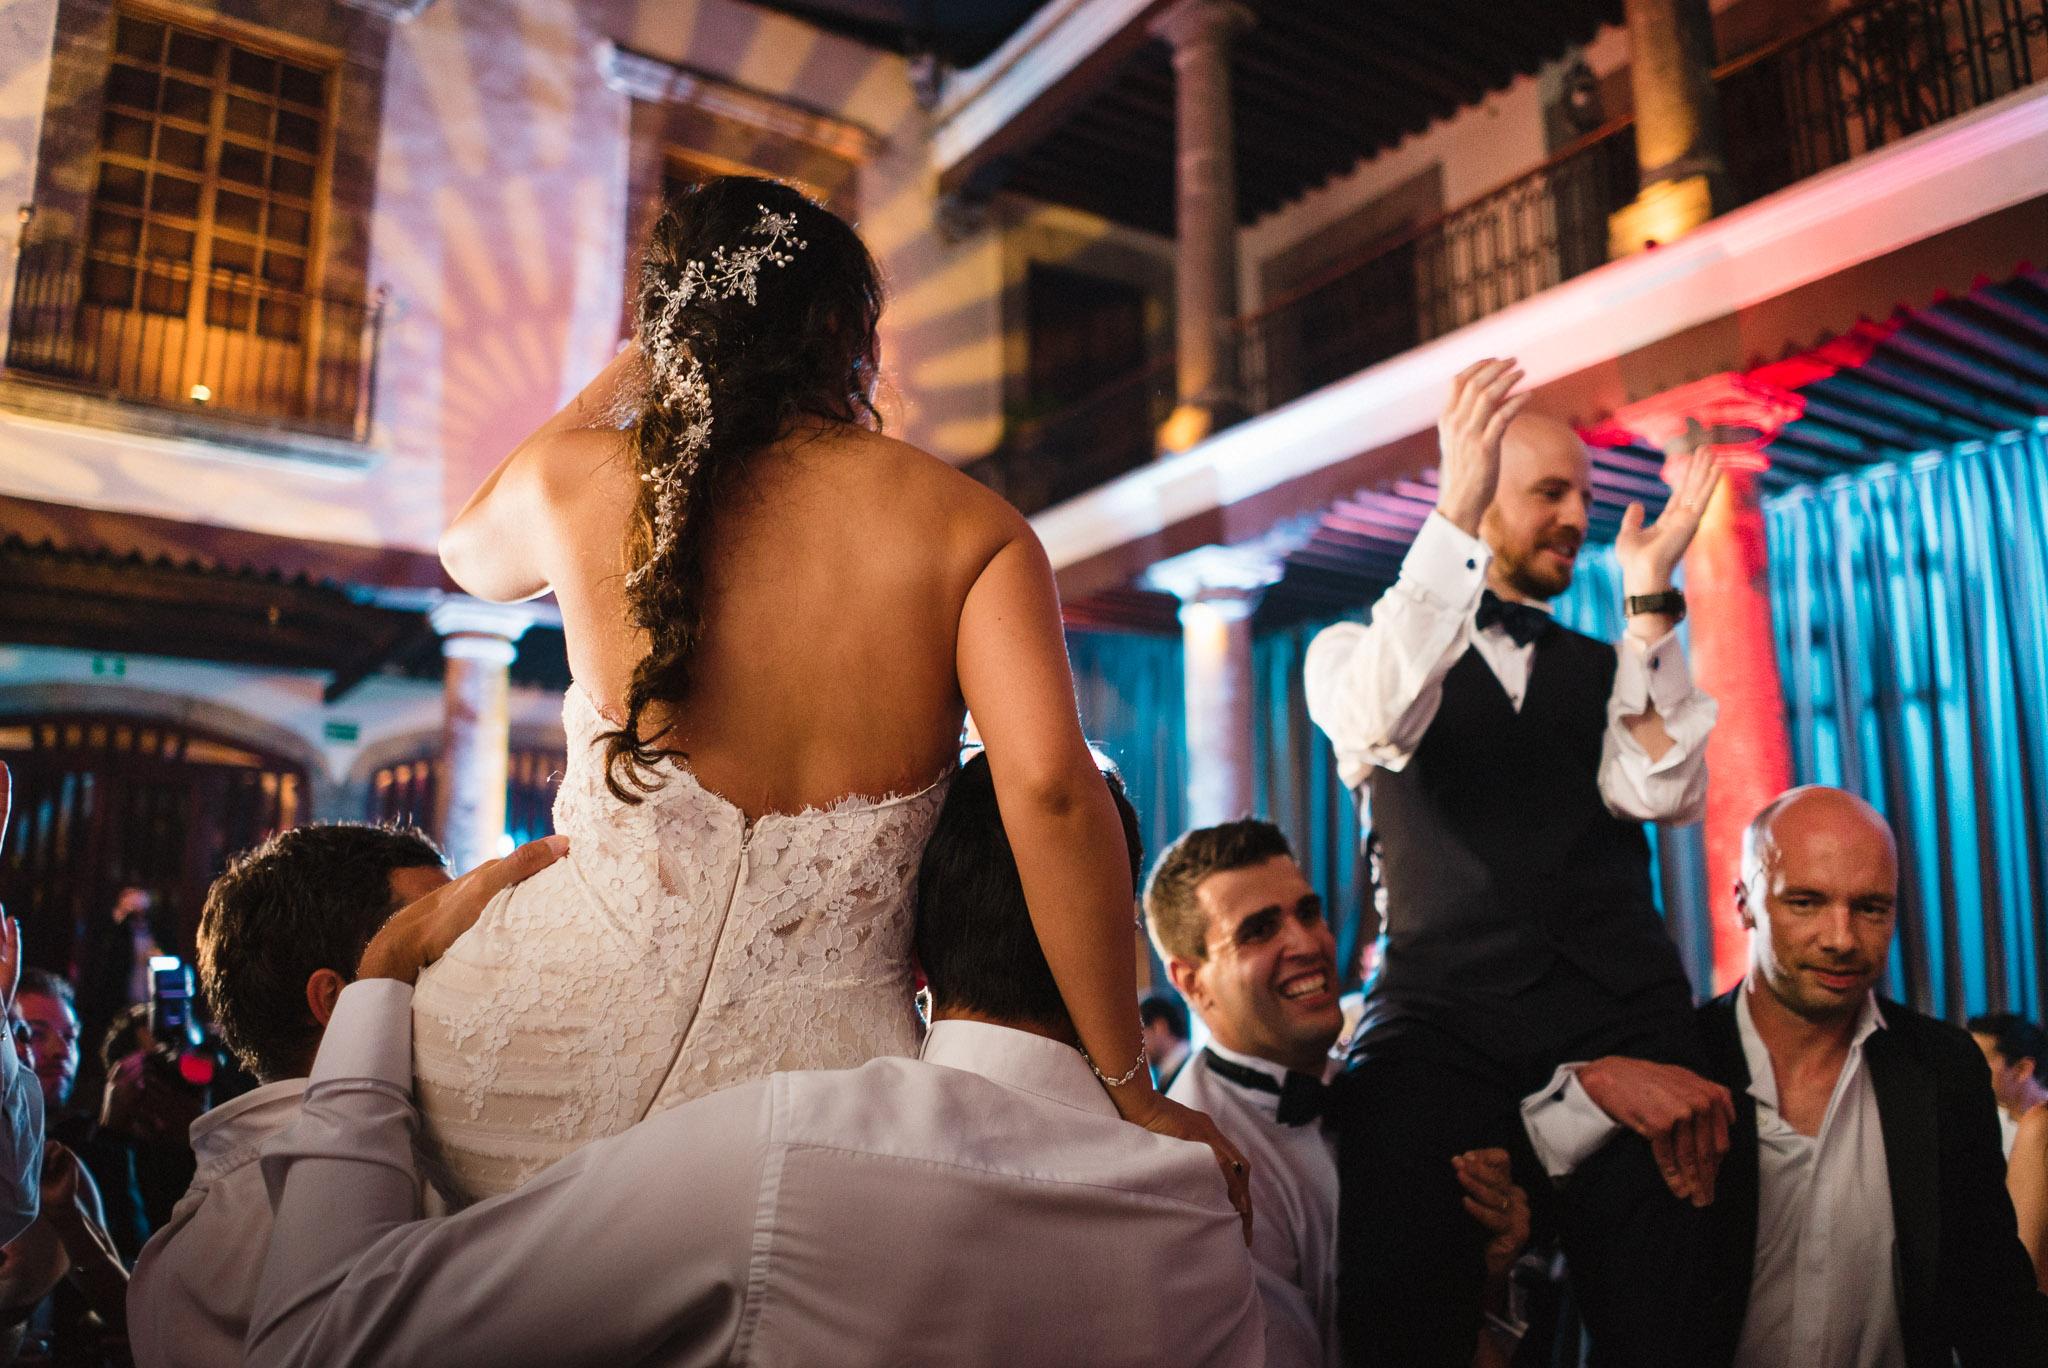 ©www.mauriziosolisbroca.com-20161002maurizio-solis-broca-mexico-canada-wedding-photographer20161002DSC09768-Edit.jpg